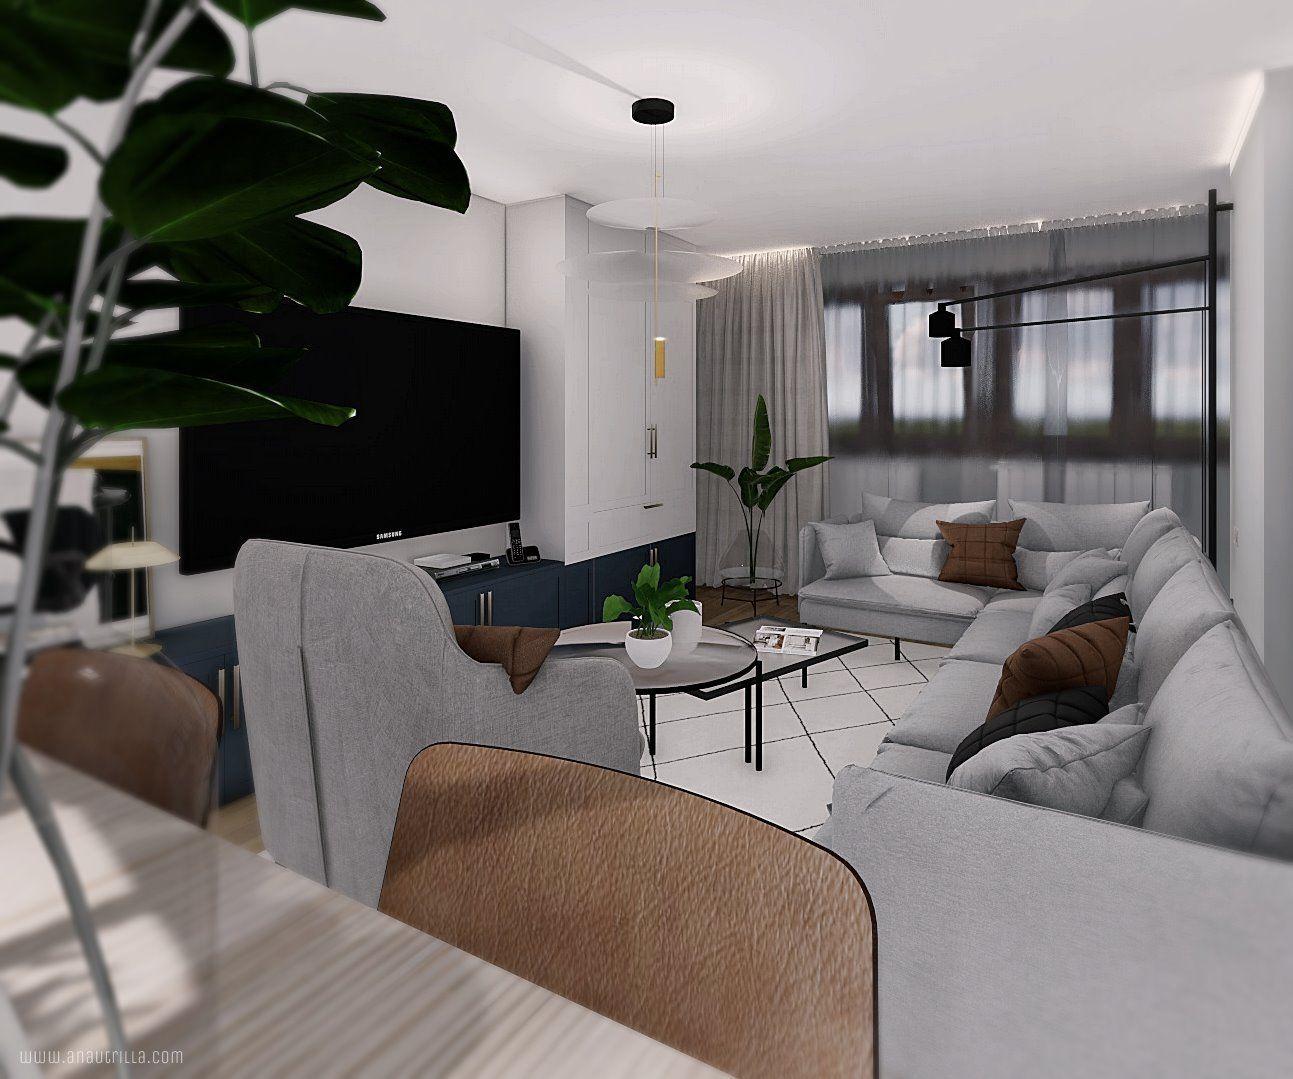 proyecto interiorismo 3D a medida, espacio de salón comedor y cocina, de concepto abierto y tonos azules #Anautrillainteriorismo #slowinteriordesign @utrillanais